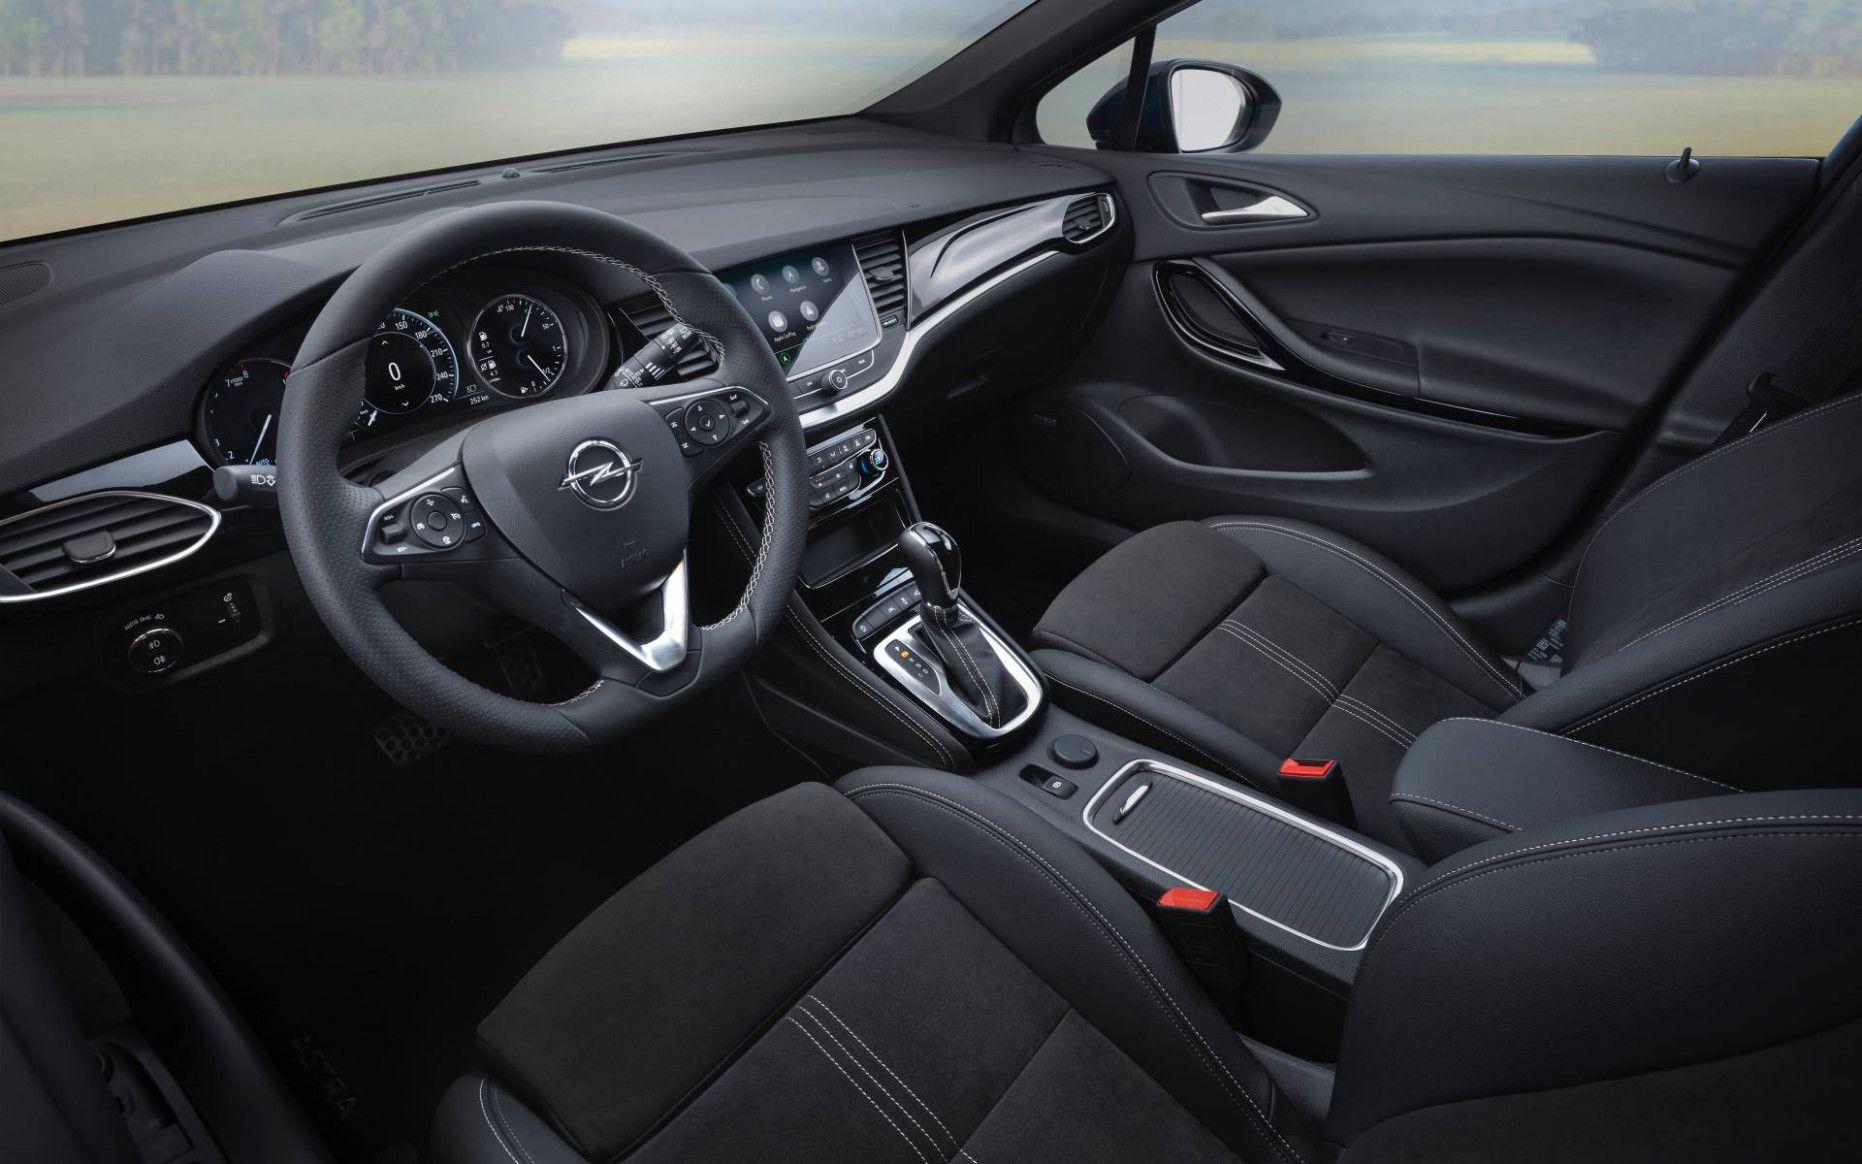 Opel Astra 2020 White Spy Shoot 2020 Car Reviews Opel Vauxhall Sedan